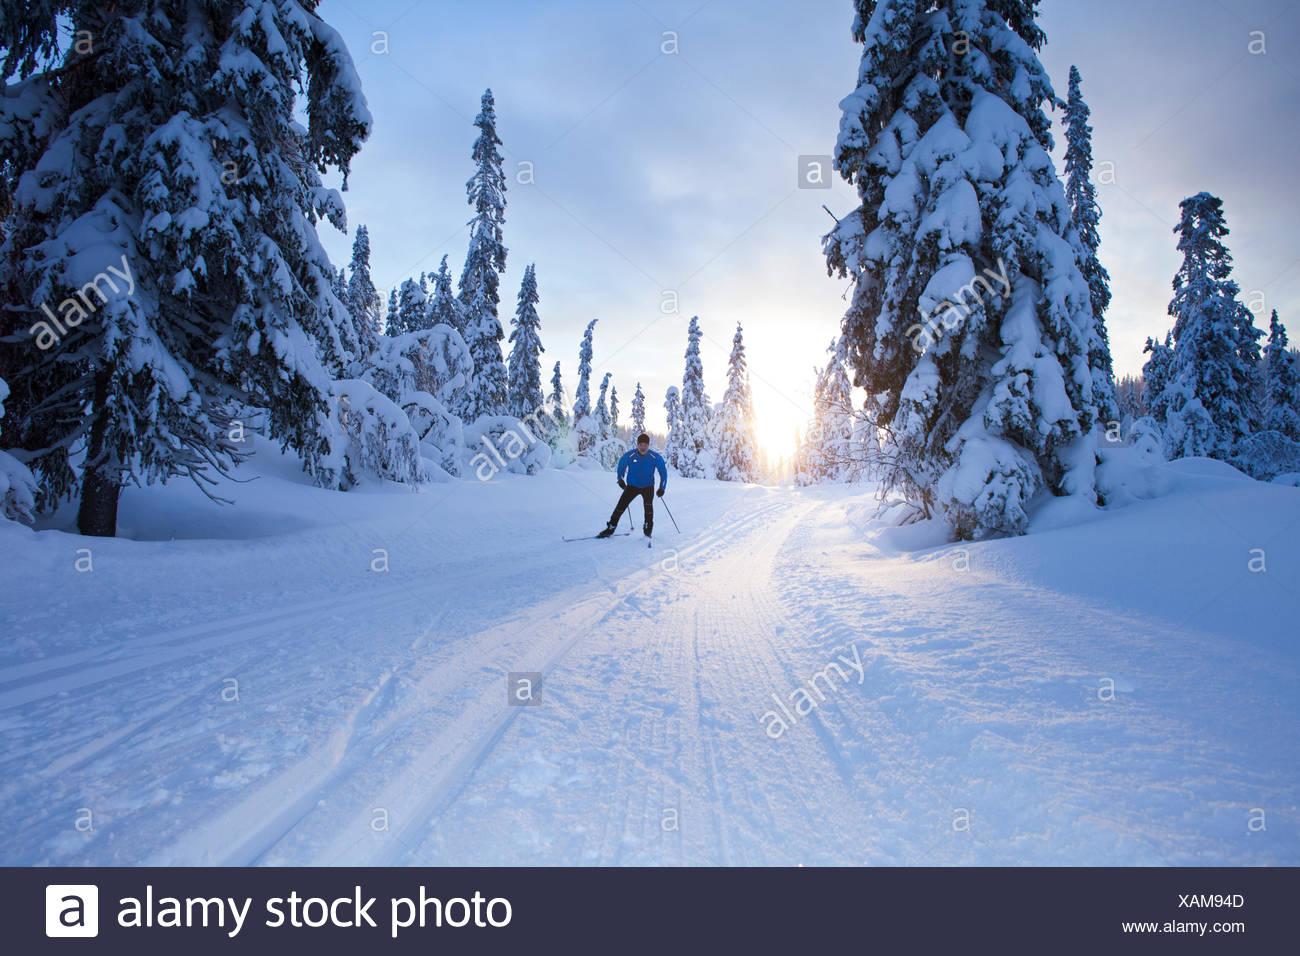 Sweden, Dalarna, Salen, Mature man cross-country skiing at dusk - Stock Image